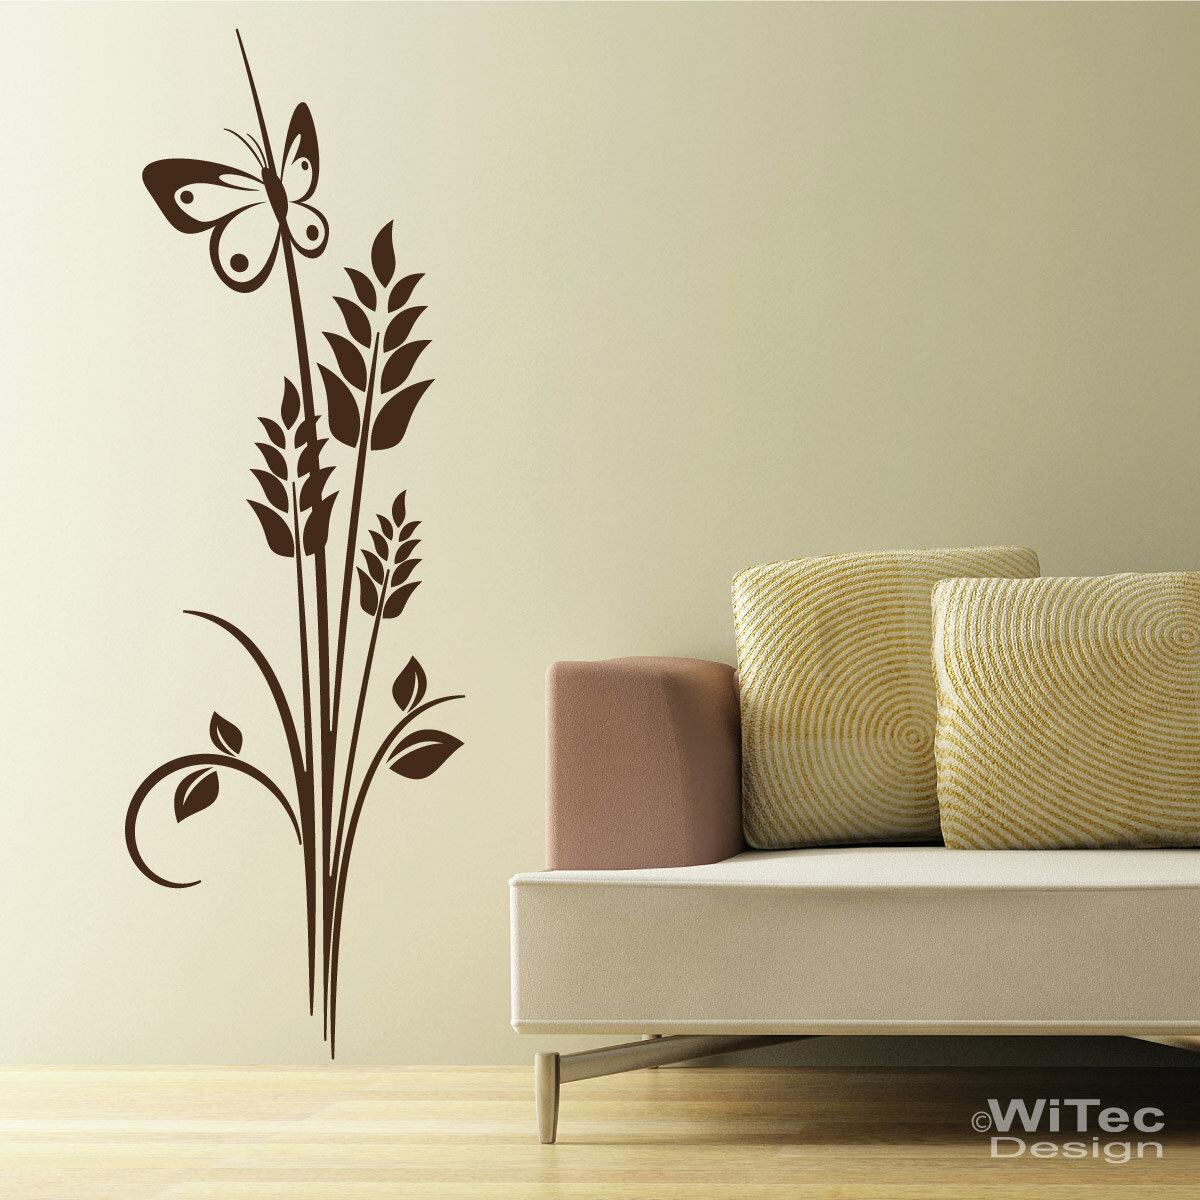 wandtattoo pflanze blumen schmetterling wandaufkleber. Black Bedroom Furniture Sets. Home Design Ideas